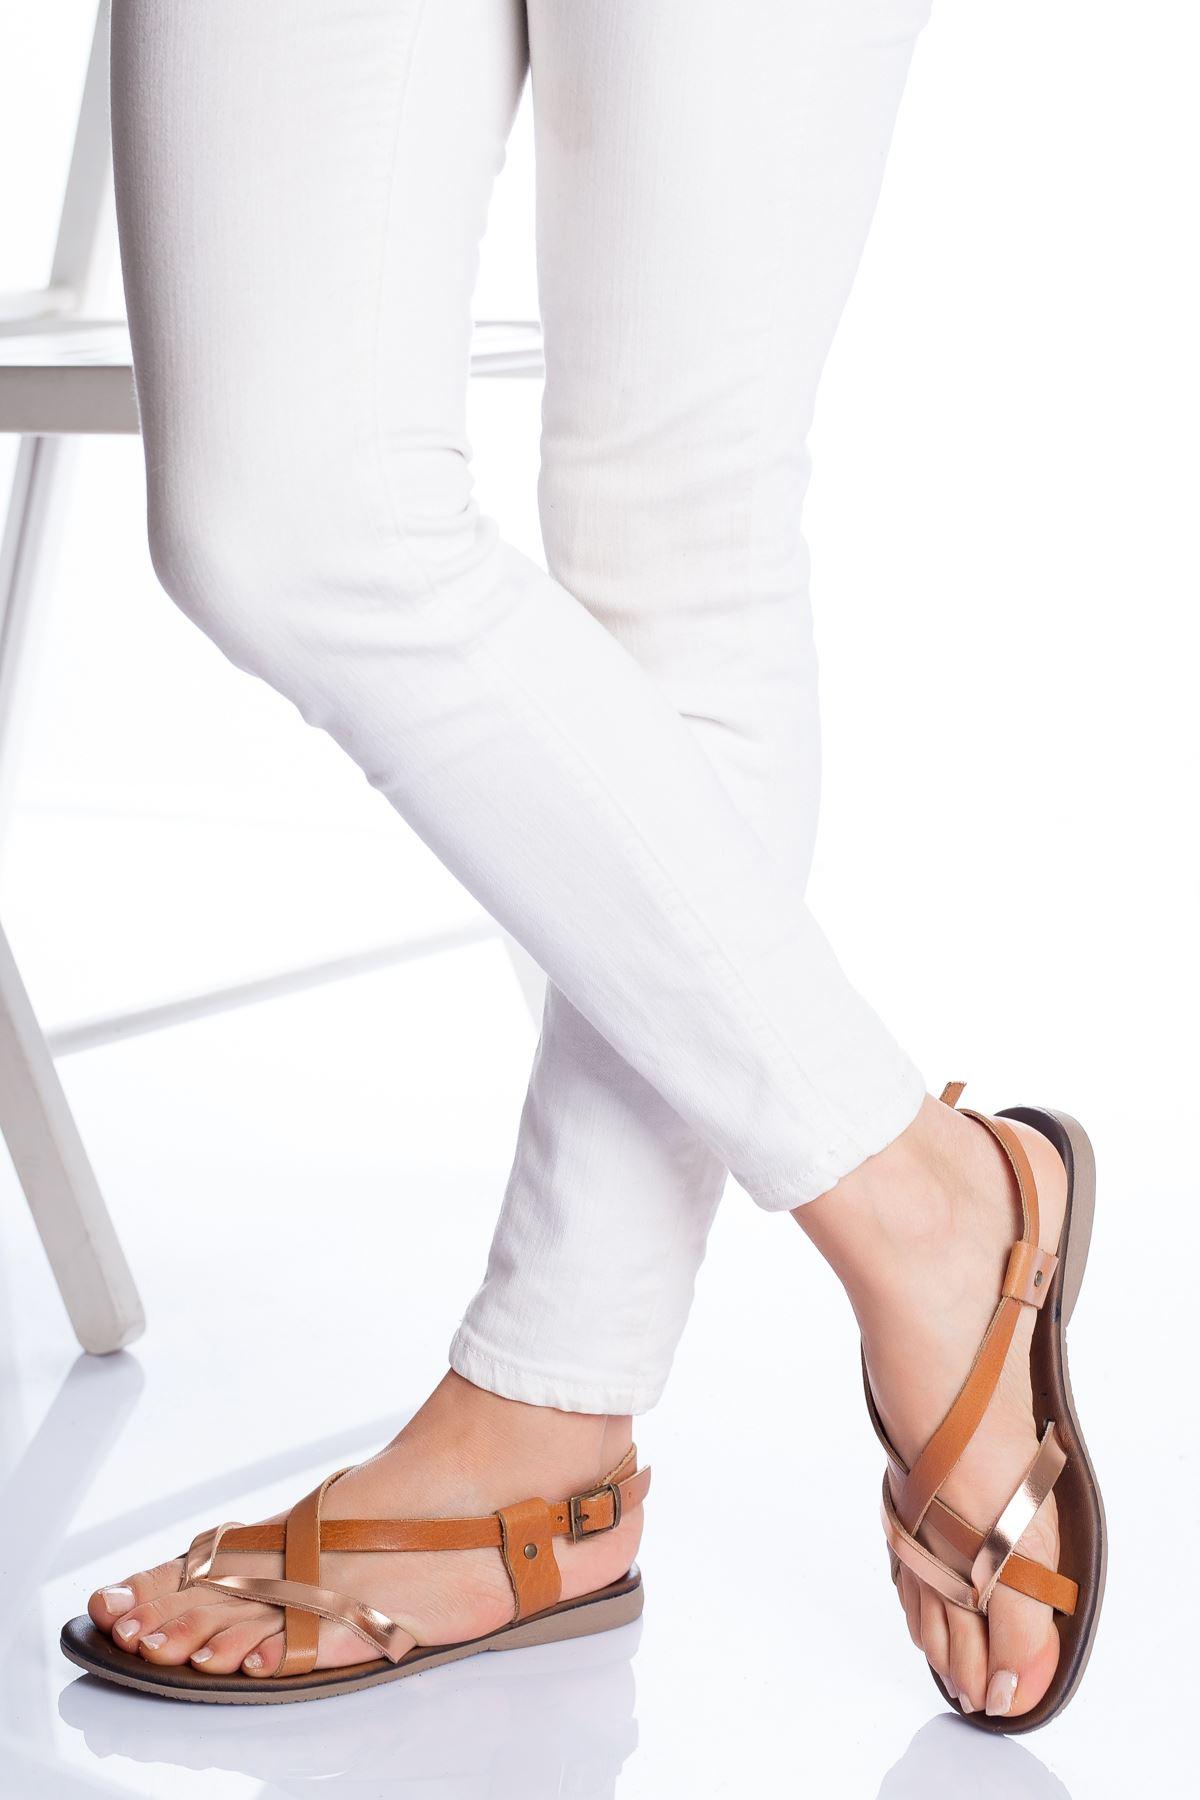 Amara Hakiki Deri Sandalet TABA